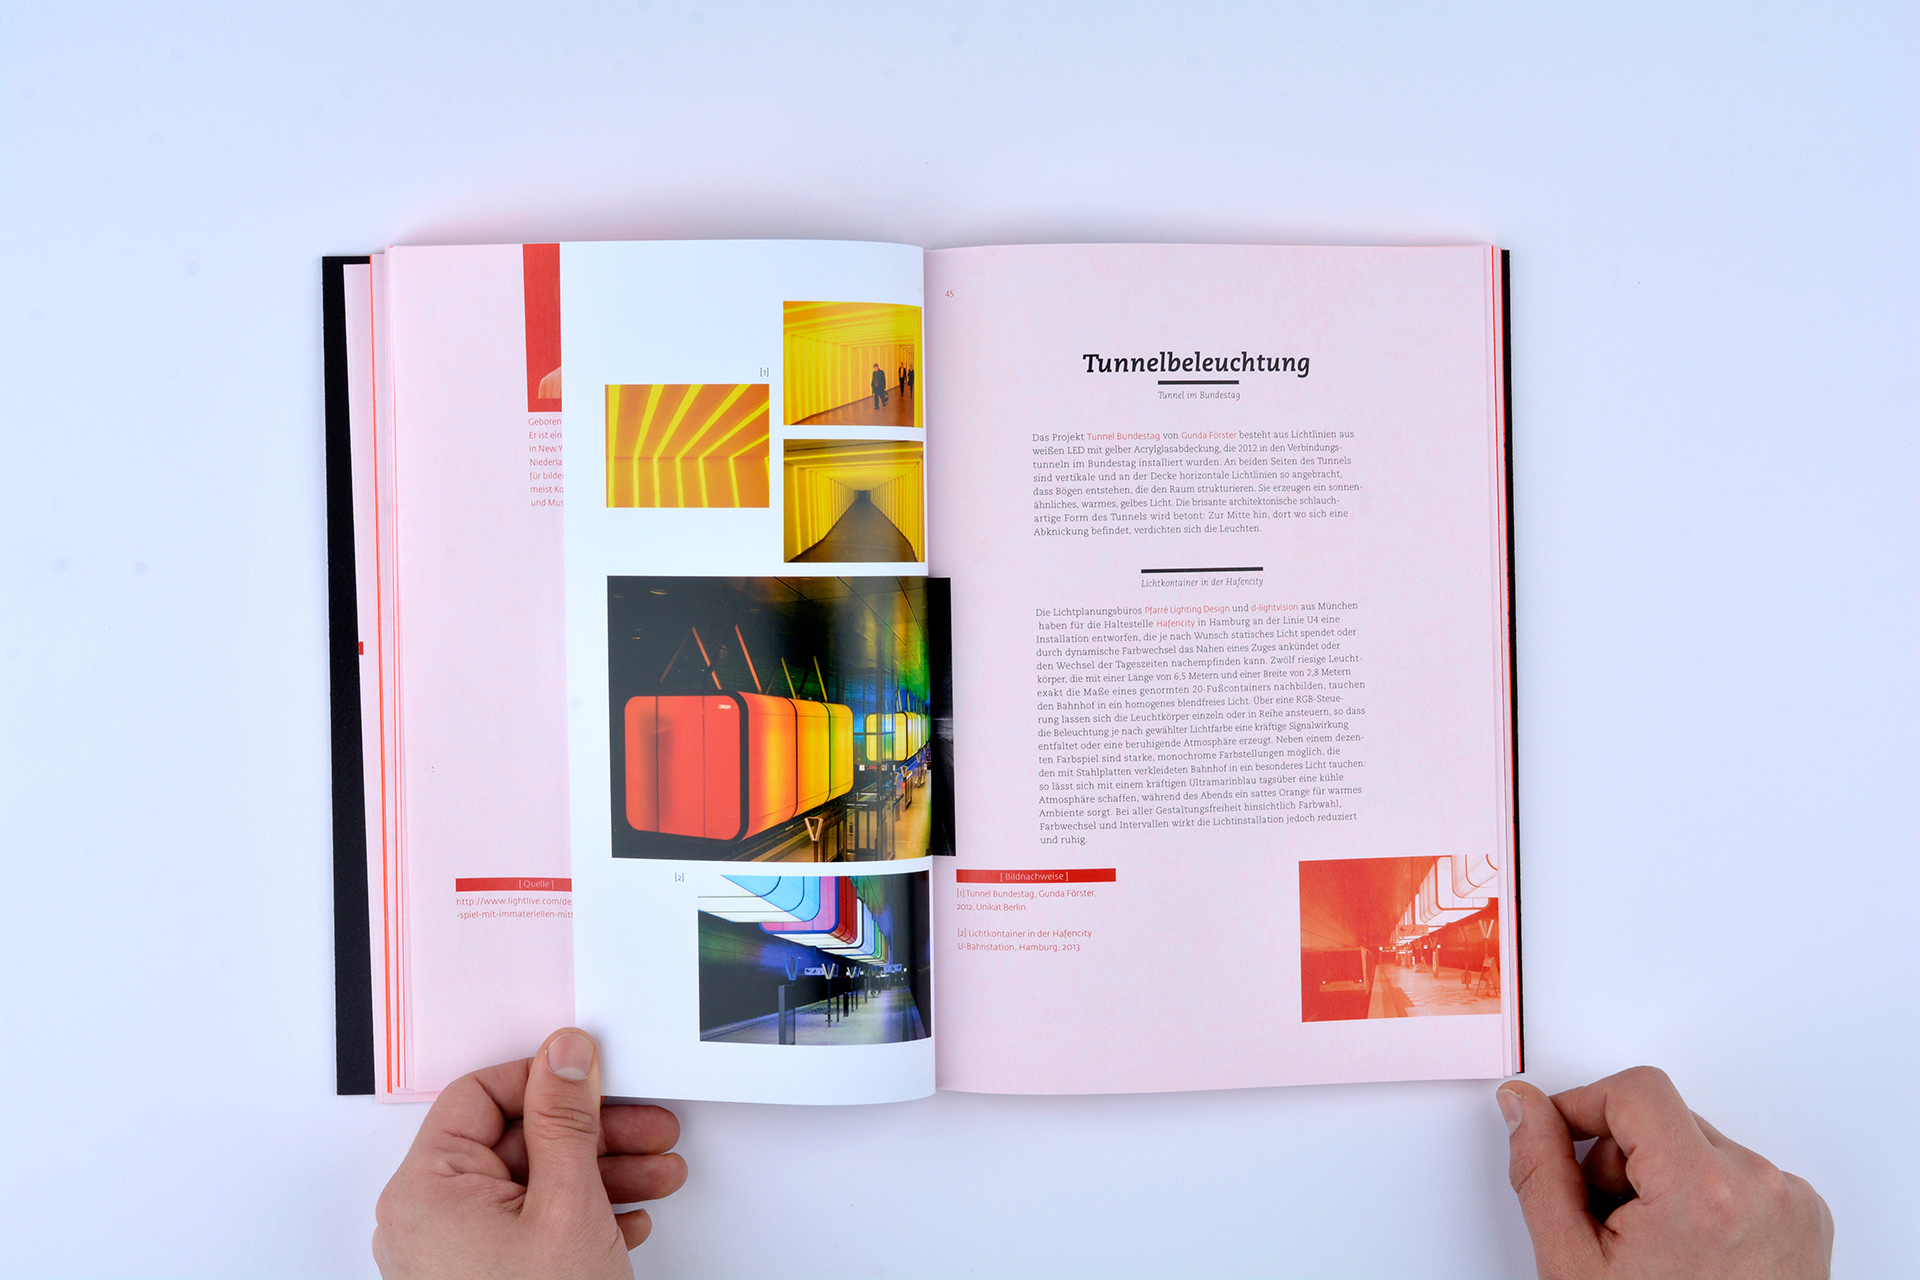 Buchgestaltung, Editorial, Licht, Konzept, Rot, Japanische Bindung, Design, Fh Münster, Bennet Grüttner